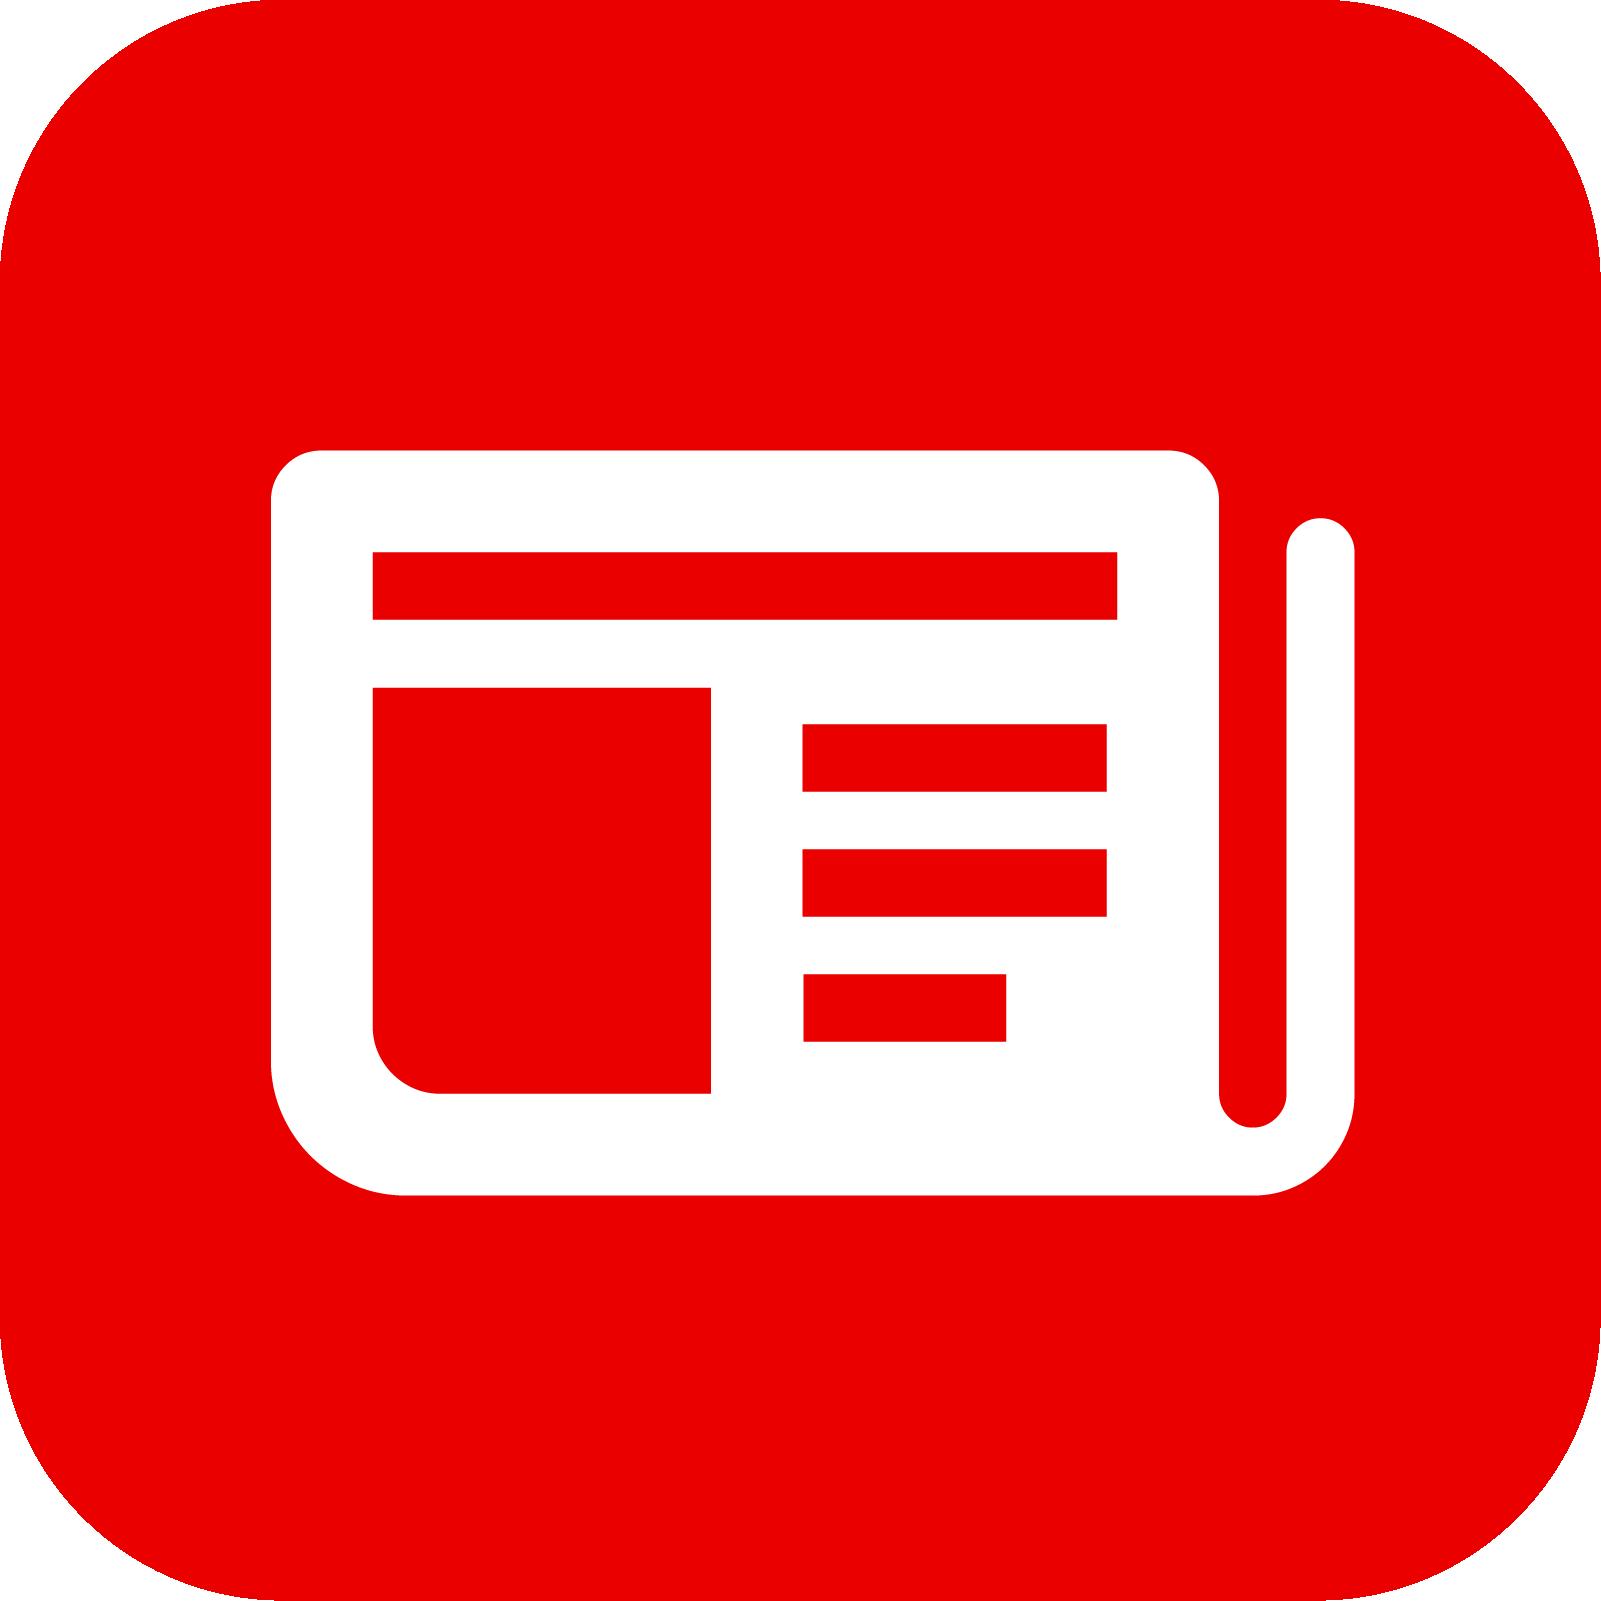 Msn Australia Latest News Hotmail Login Outlook Skype And Video